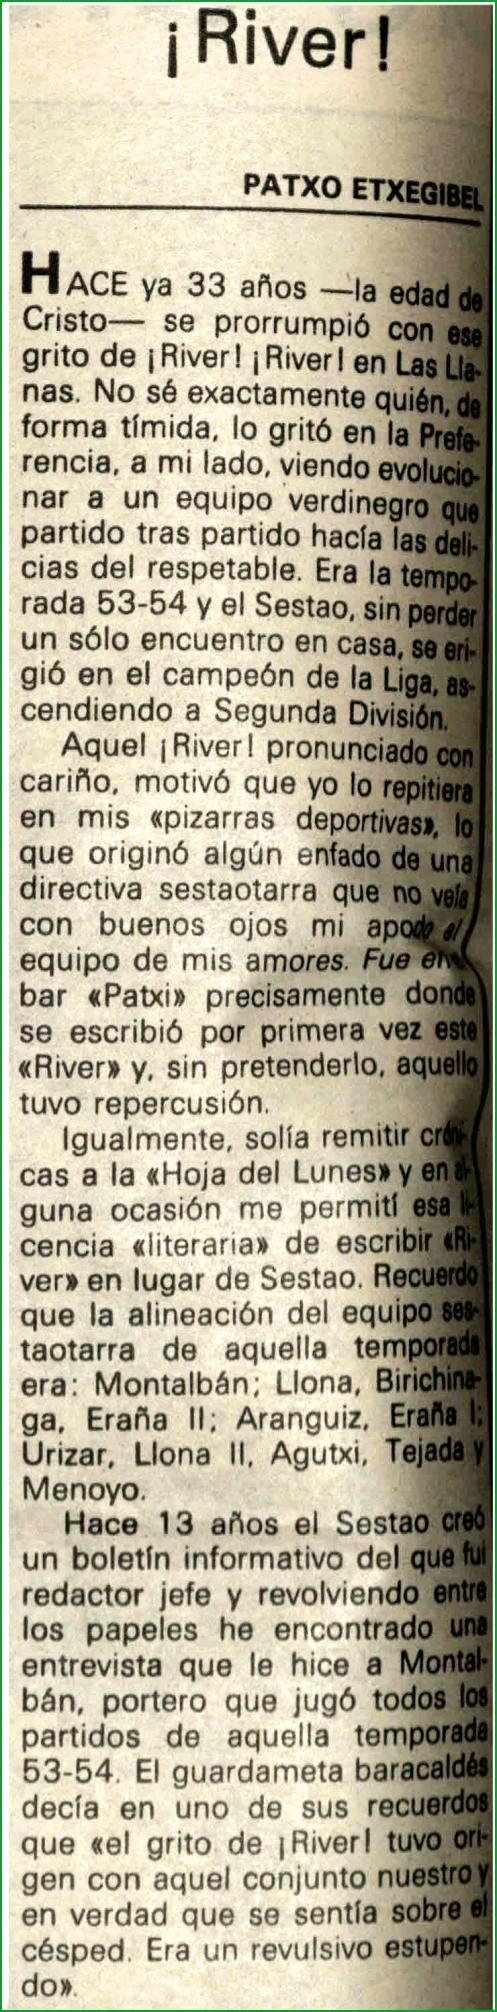 patxo-etxegibel-river-1987